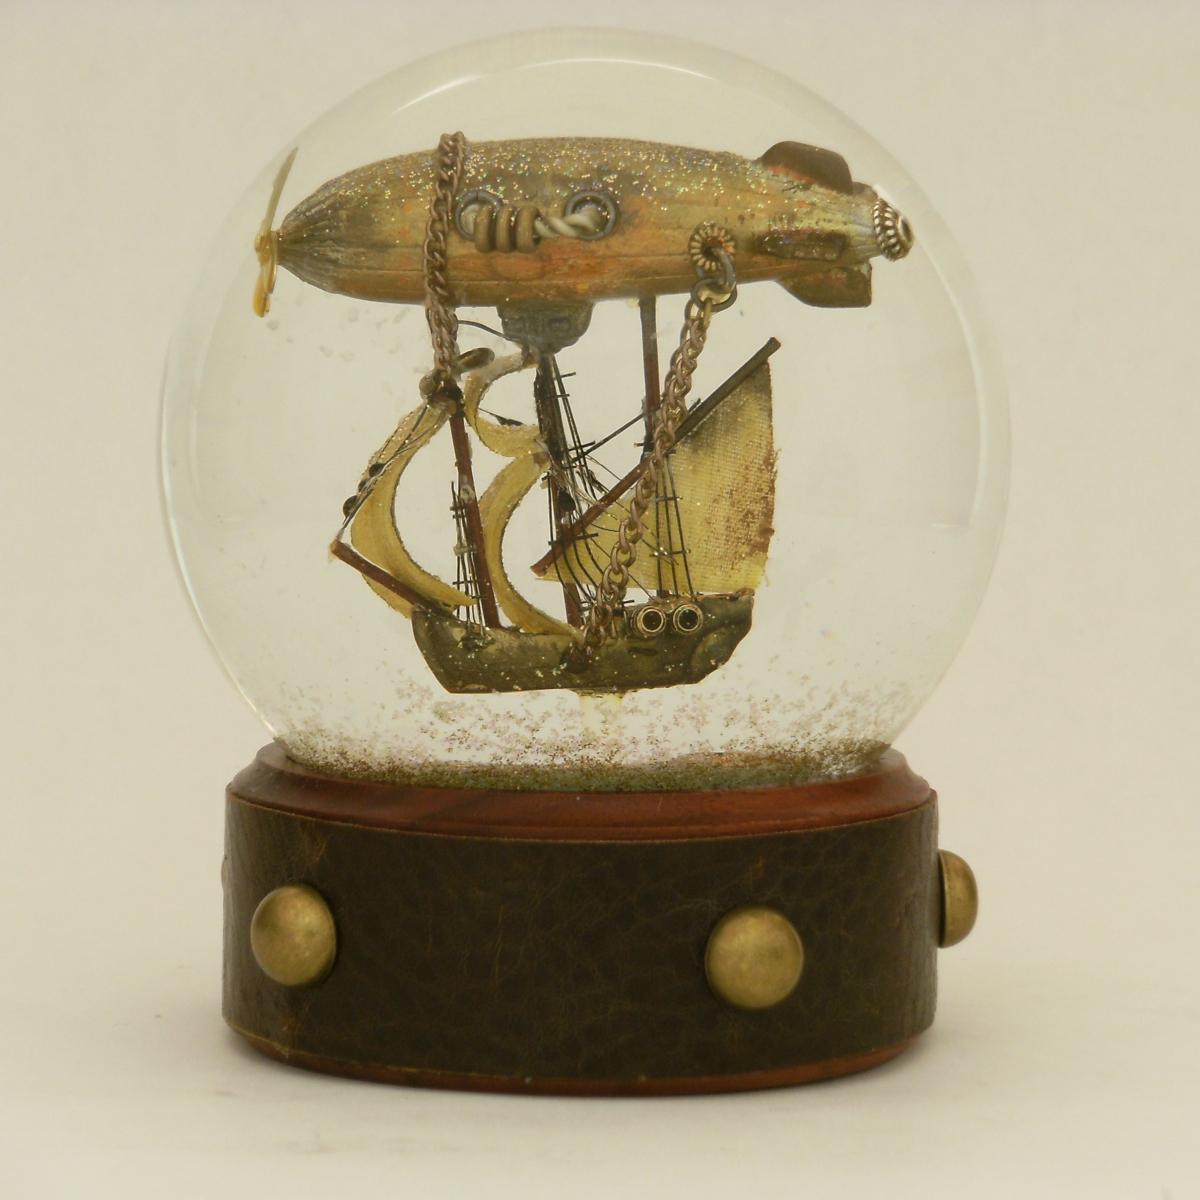 Airship Voyager Snow Globe, Camryn Forrest Designs 2012